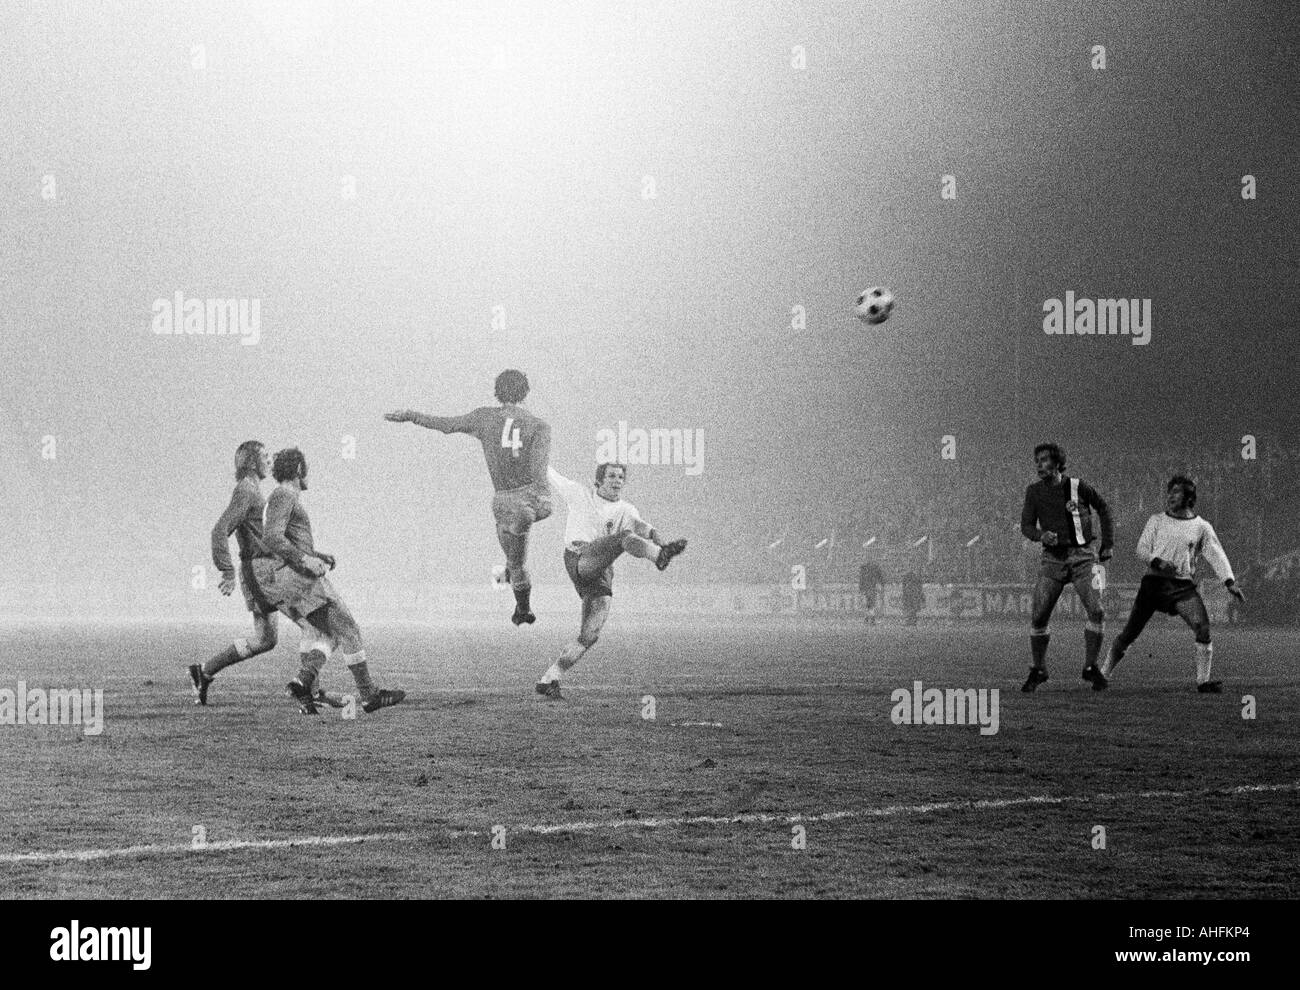 football, Bundesliga, 1971/1972, Rot-Weiss Oberhausen versus Arminia Bielefeld 2:0, Niederrhein Stadium in Oberhausen, scene of the match, Bernd Hoffmann (RWO) shots on goal - Stock Image